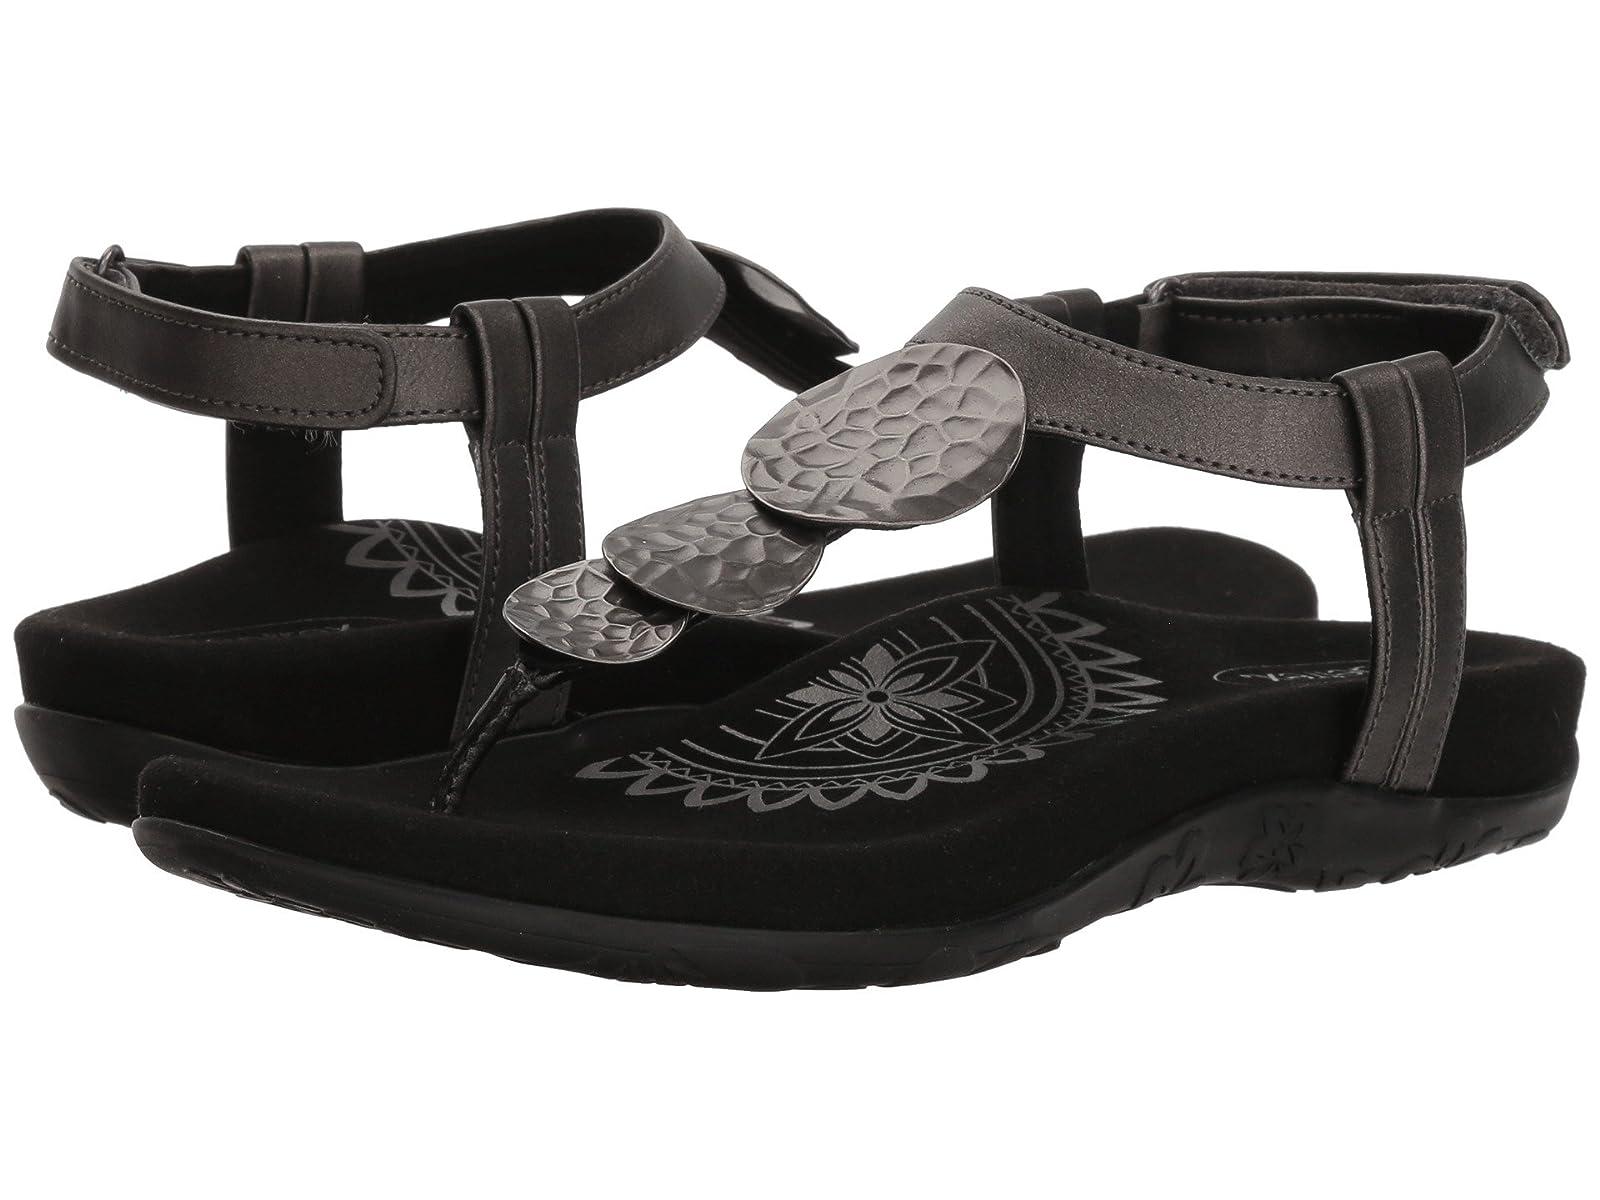 Aetrex OliveAtmospheric grades have affordable shoes